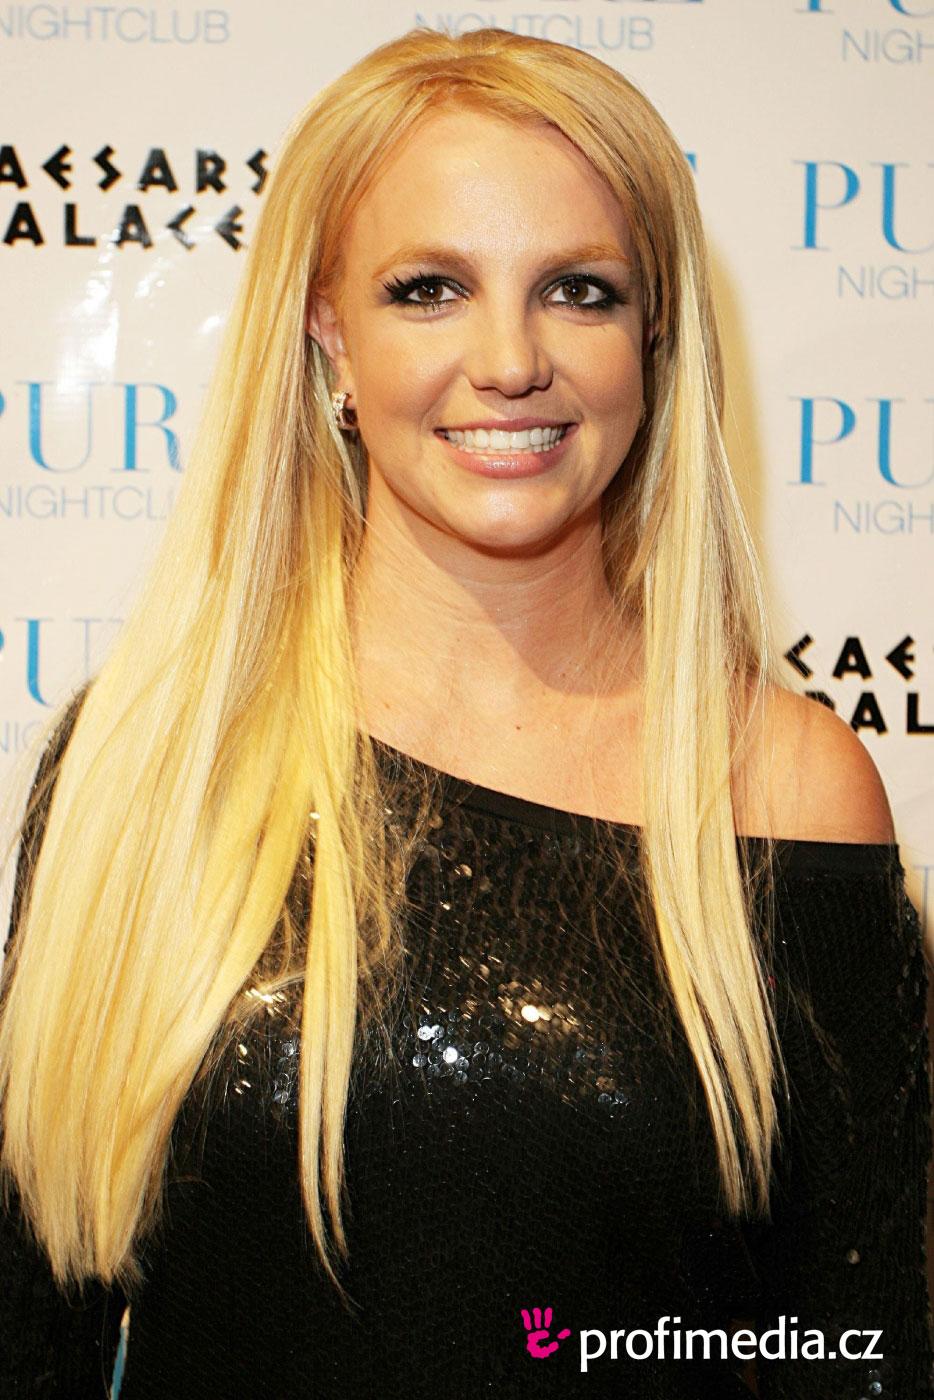 Britney Spears Hairstyle Easyhairstyler